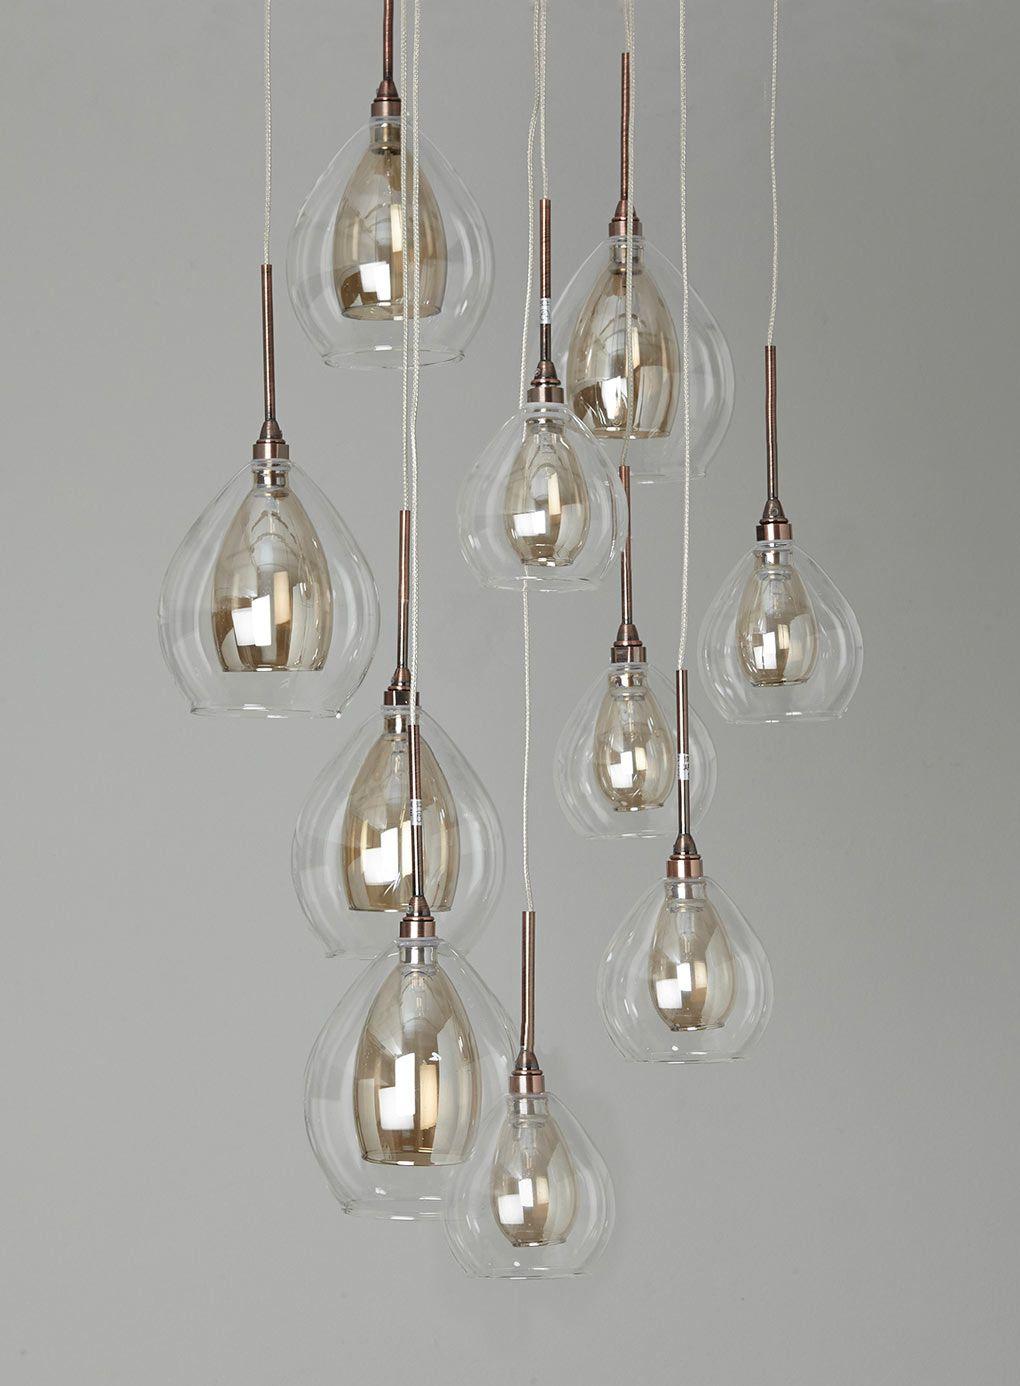 Carmella 10 Light Cluster Ceiling Lights Home Lighting Furniture Bhs